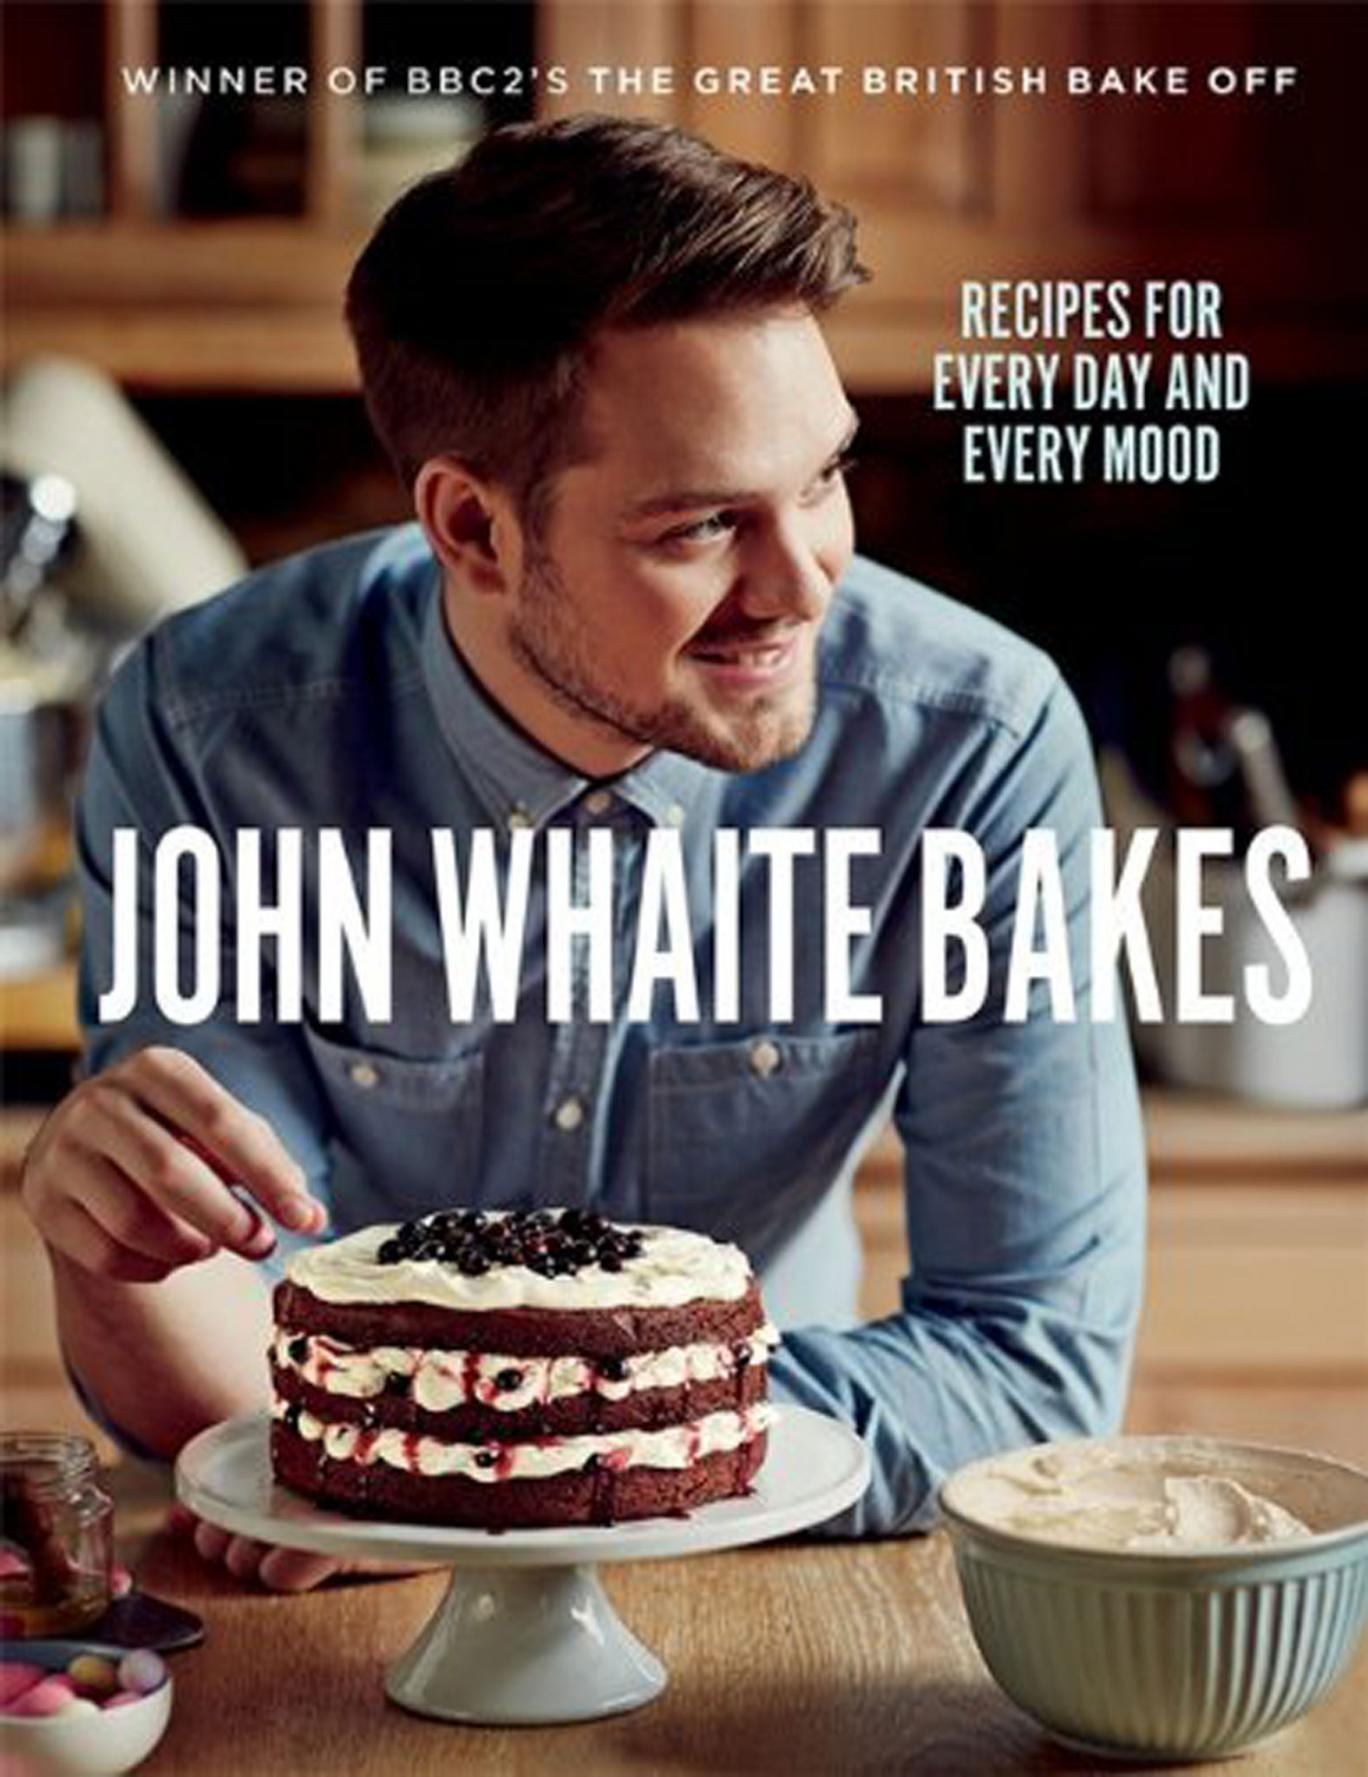 John Whaite Bakes, £20, Headline